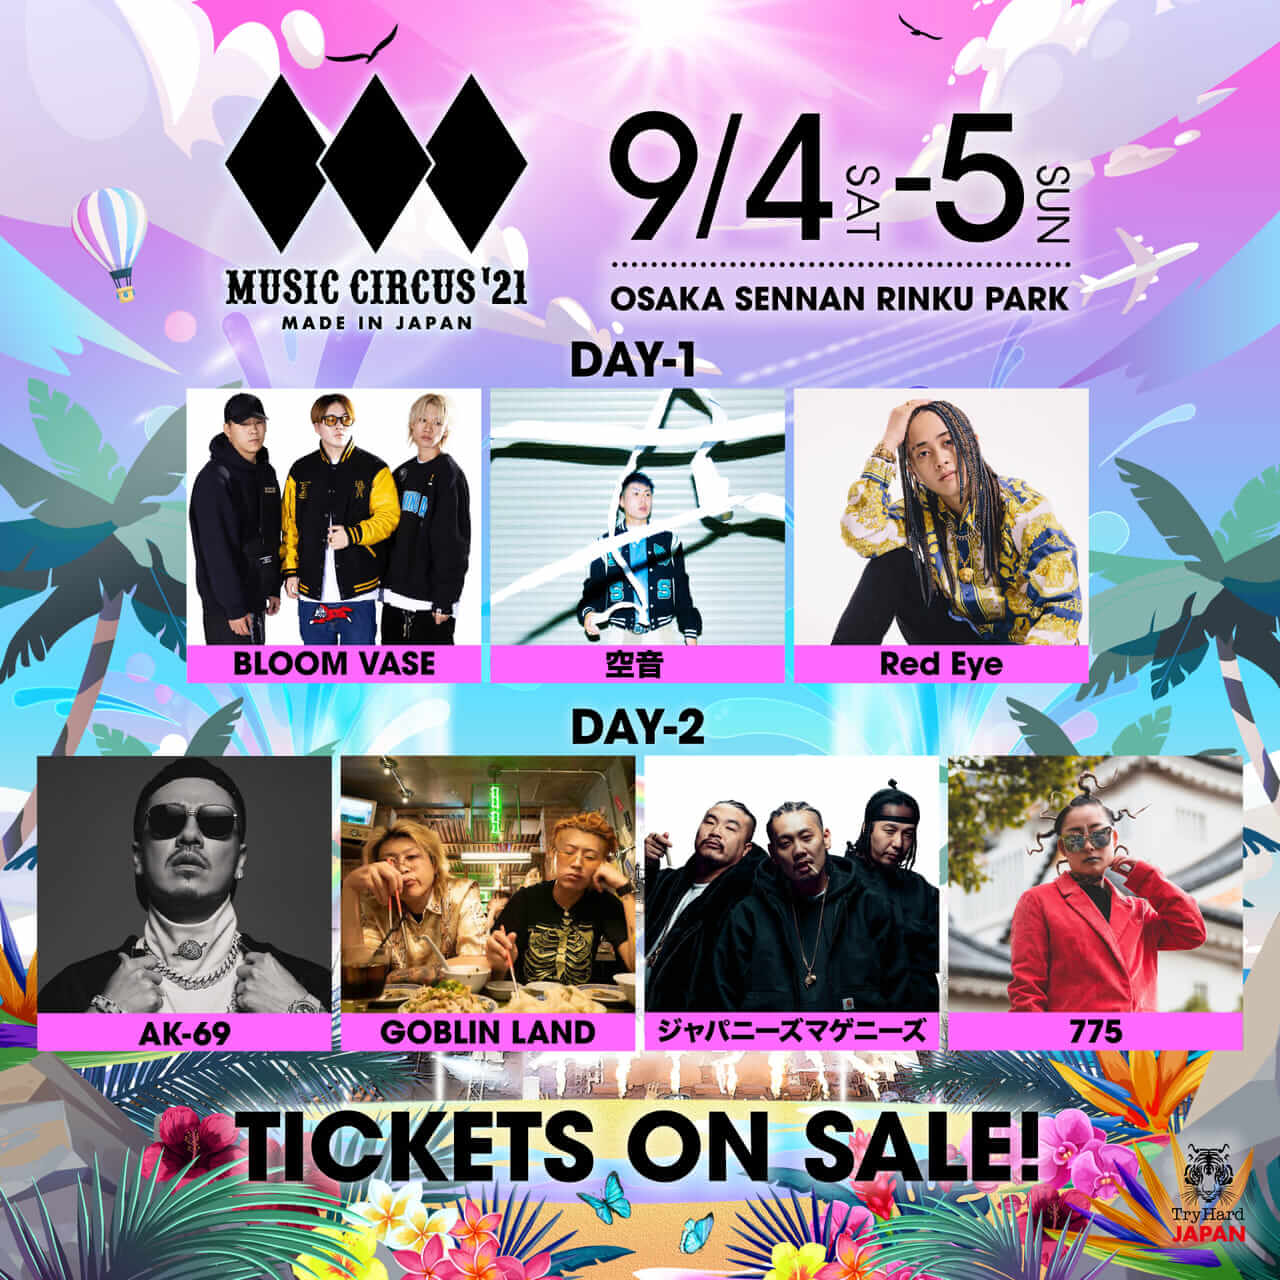 「MUSIC CIRCUS'21」、AK-69、BLOOM VASEなど第一弾出演アーティスト7組を発表